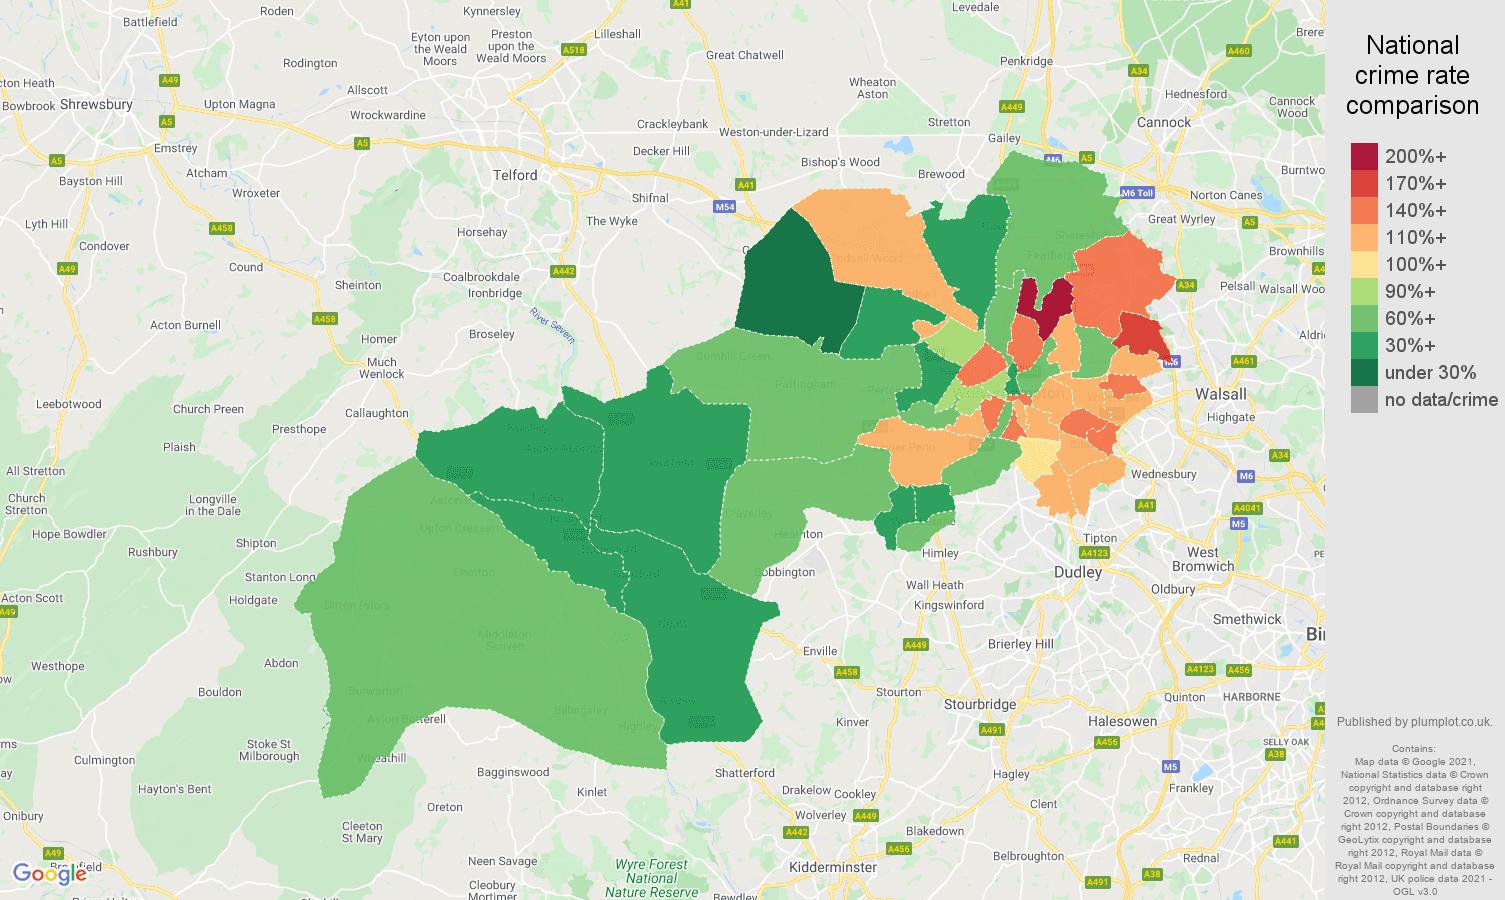 Wolverhampton criminal damage and arson crime rate comparison map